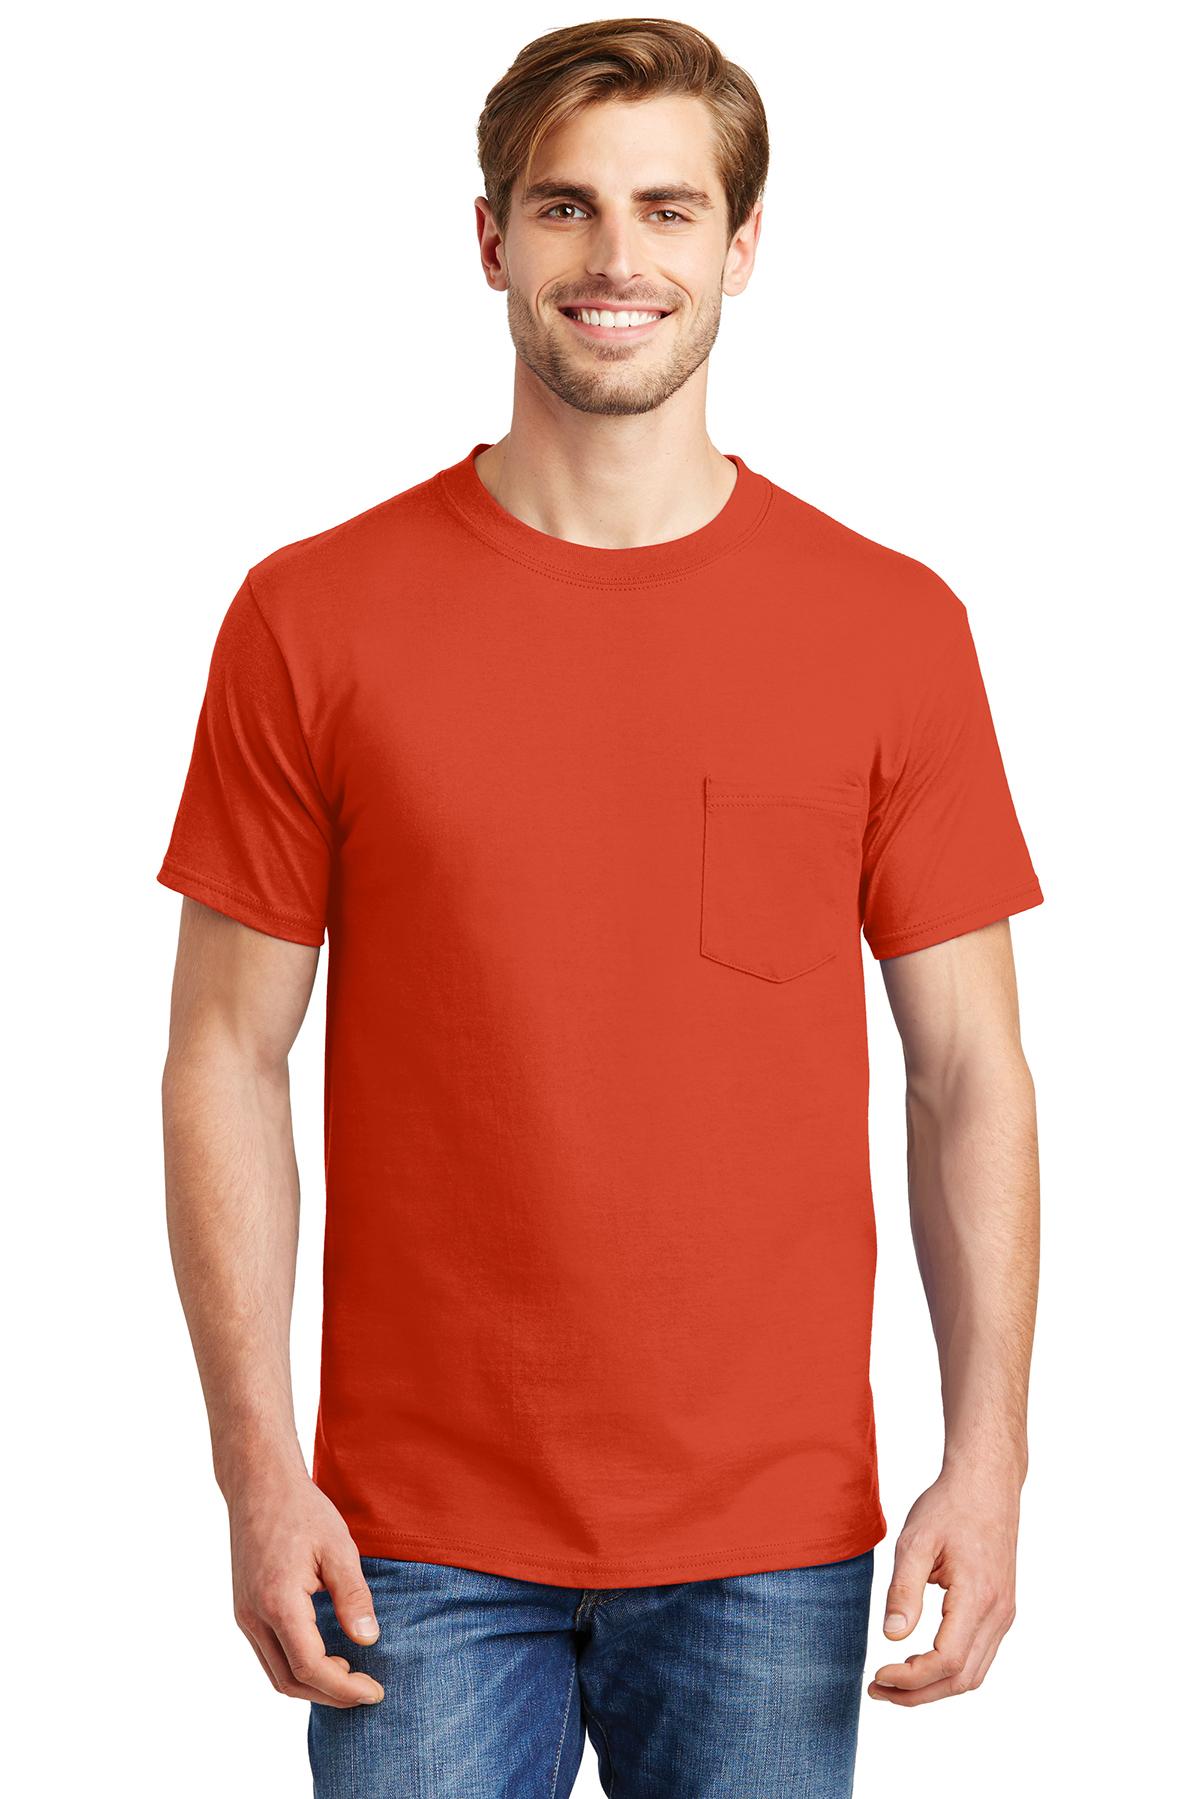 5190-Orange-for-screen-printing